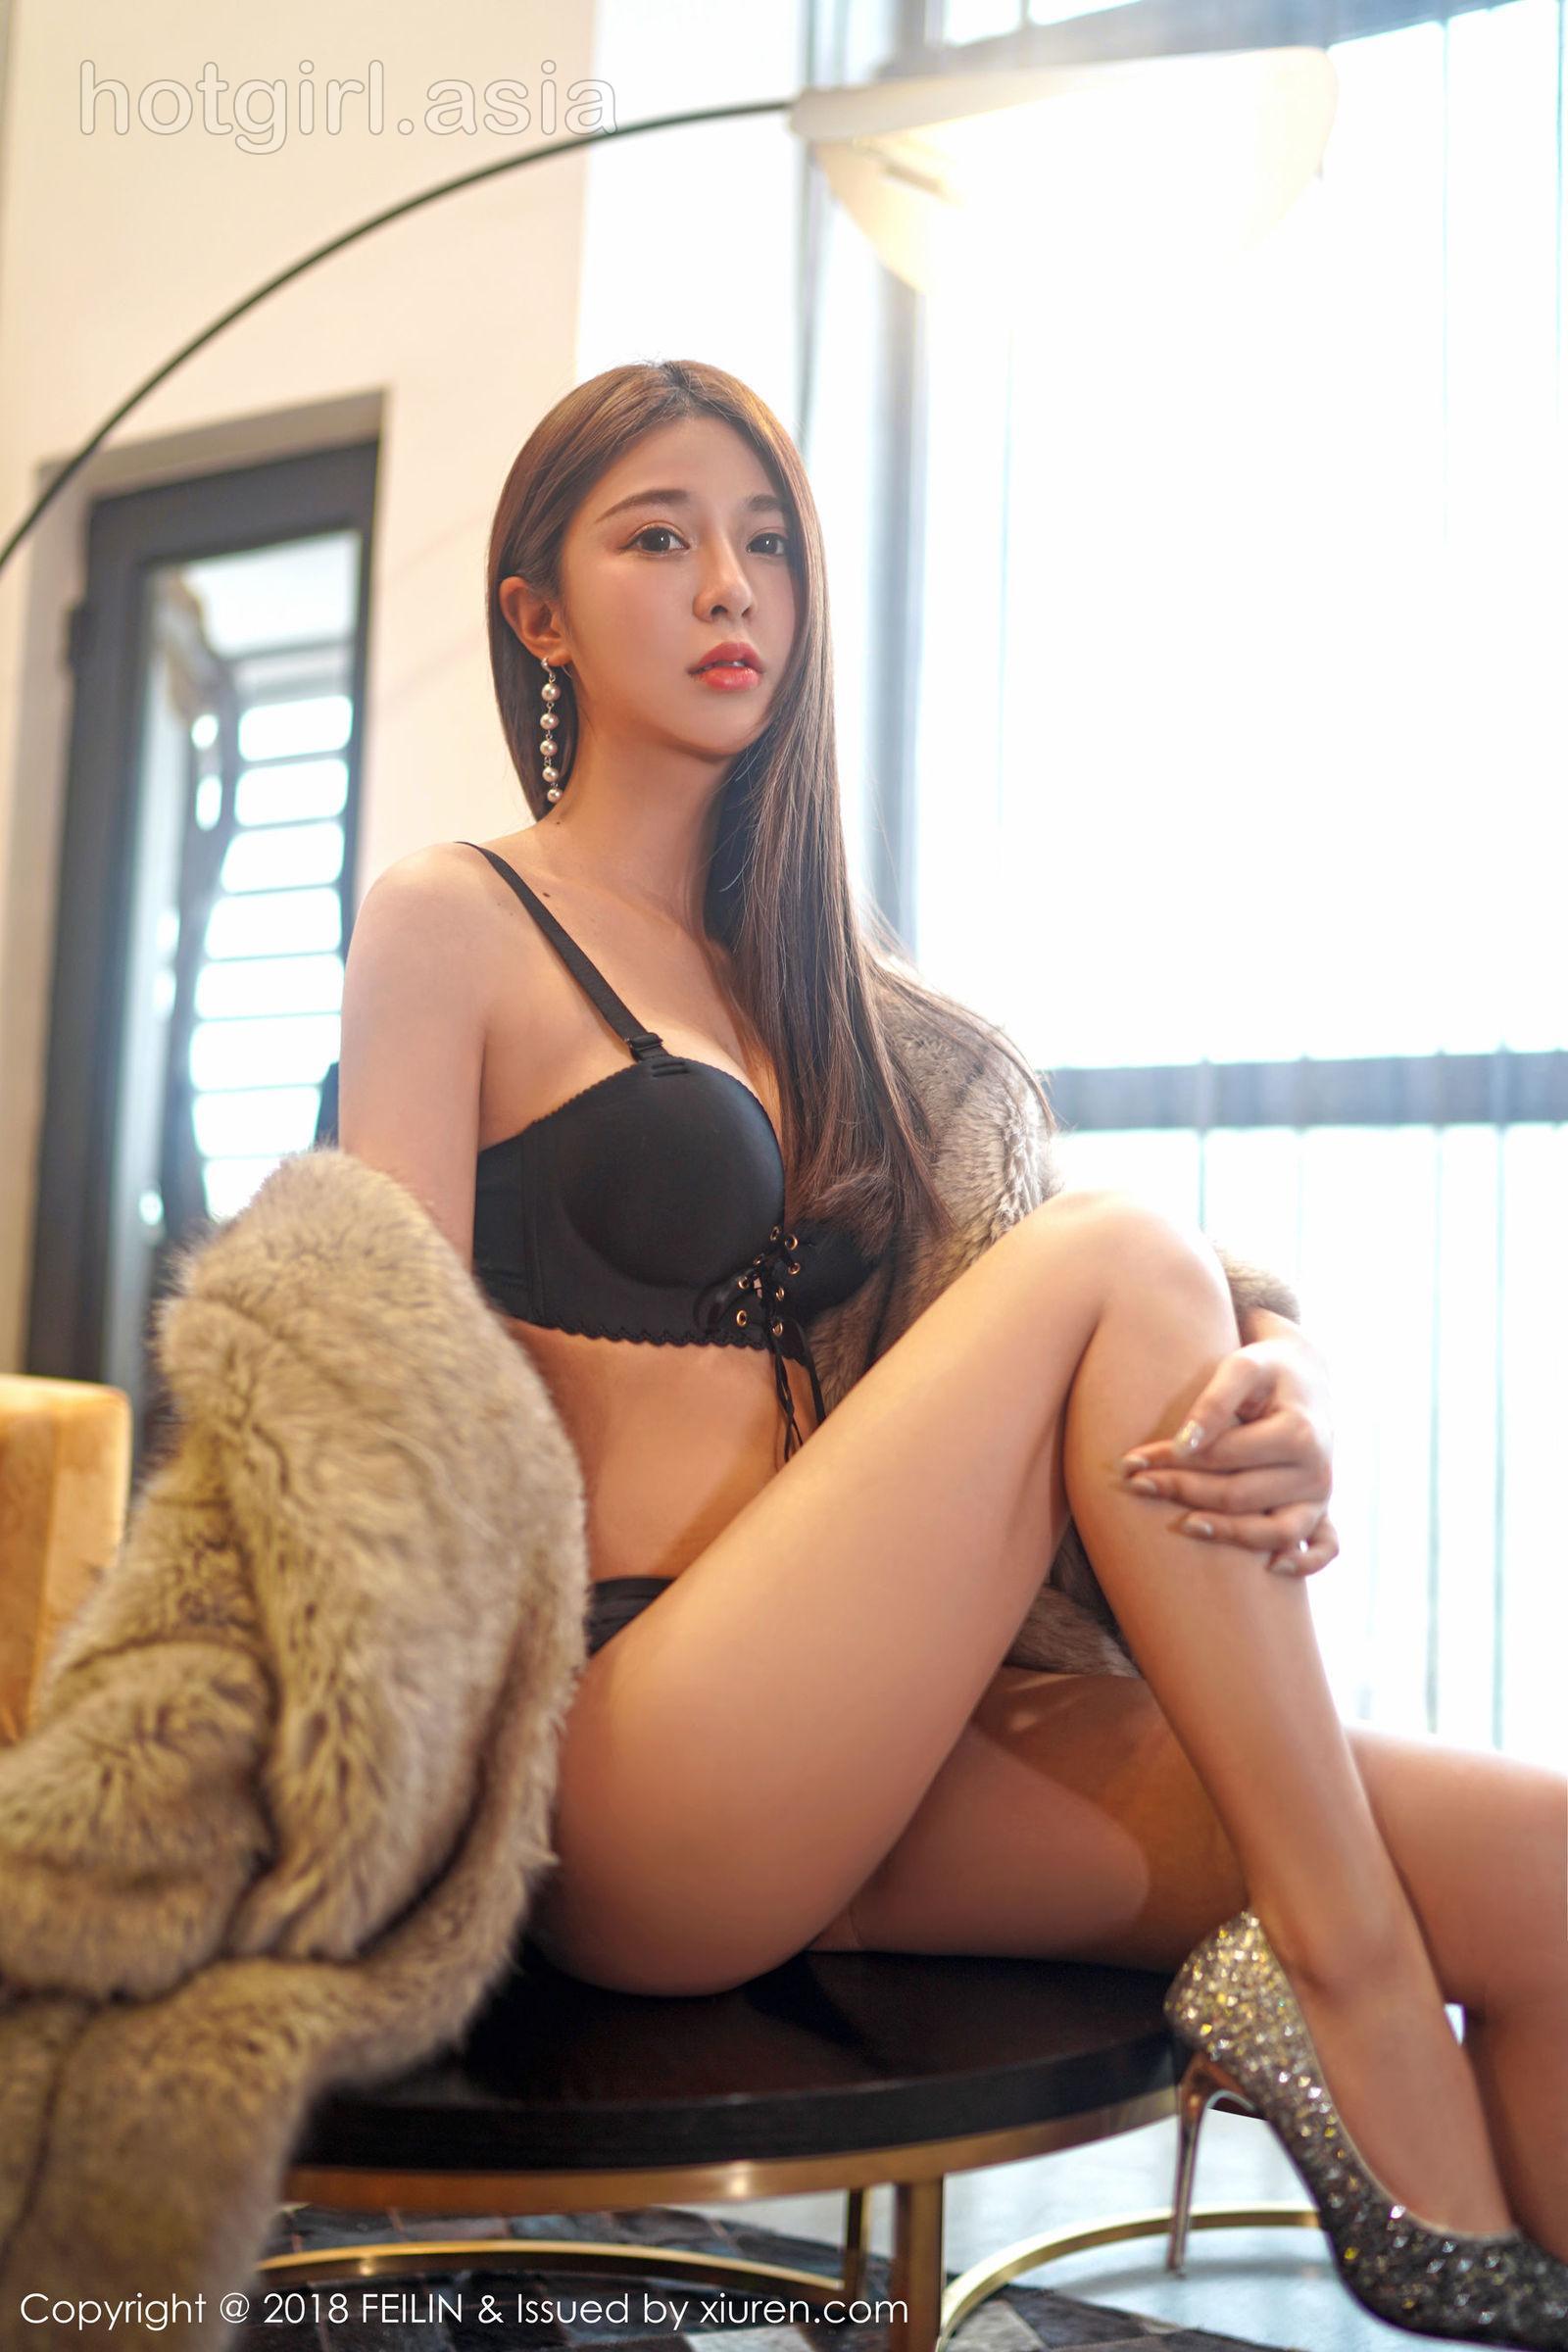 [FEILIN嗲囡囡] VOL.165 Sweet girl @luna张静燕 latest photo